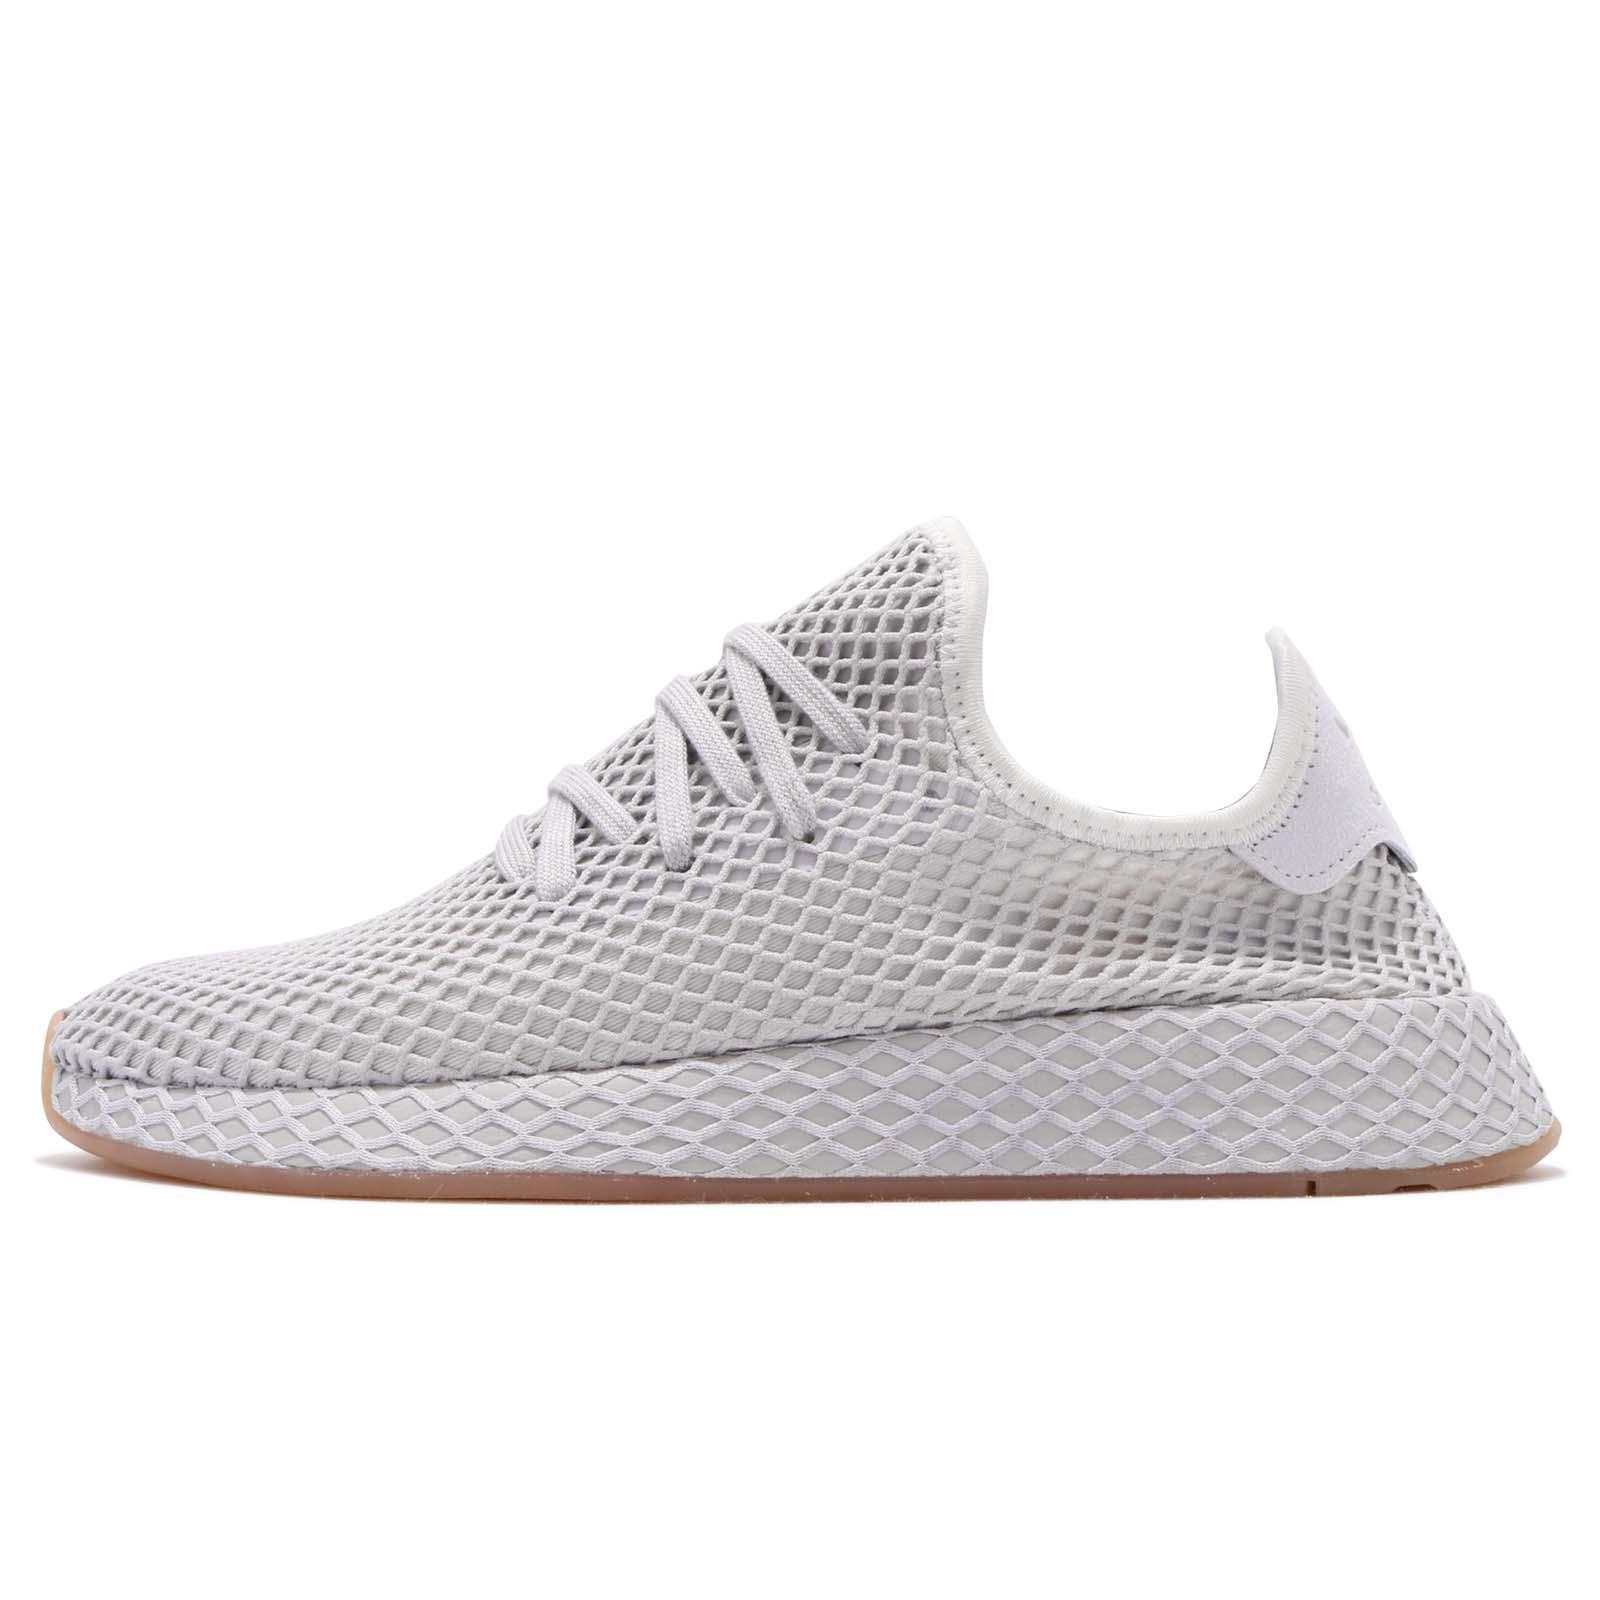 7c375be3b adidas Originals Deerupt Runner Grey Three Gum Men Running Shoes Sneakers  CQ2628